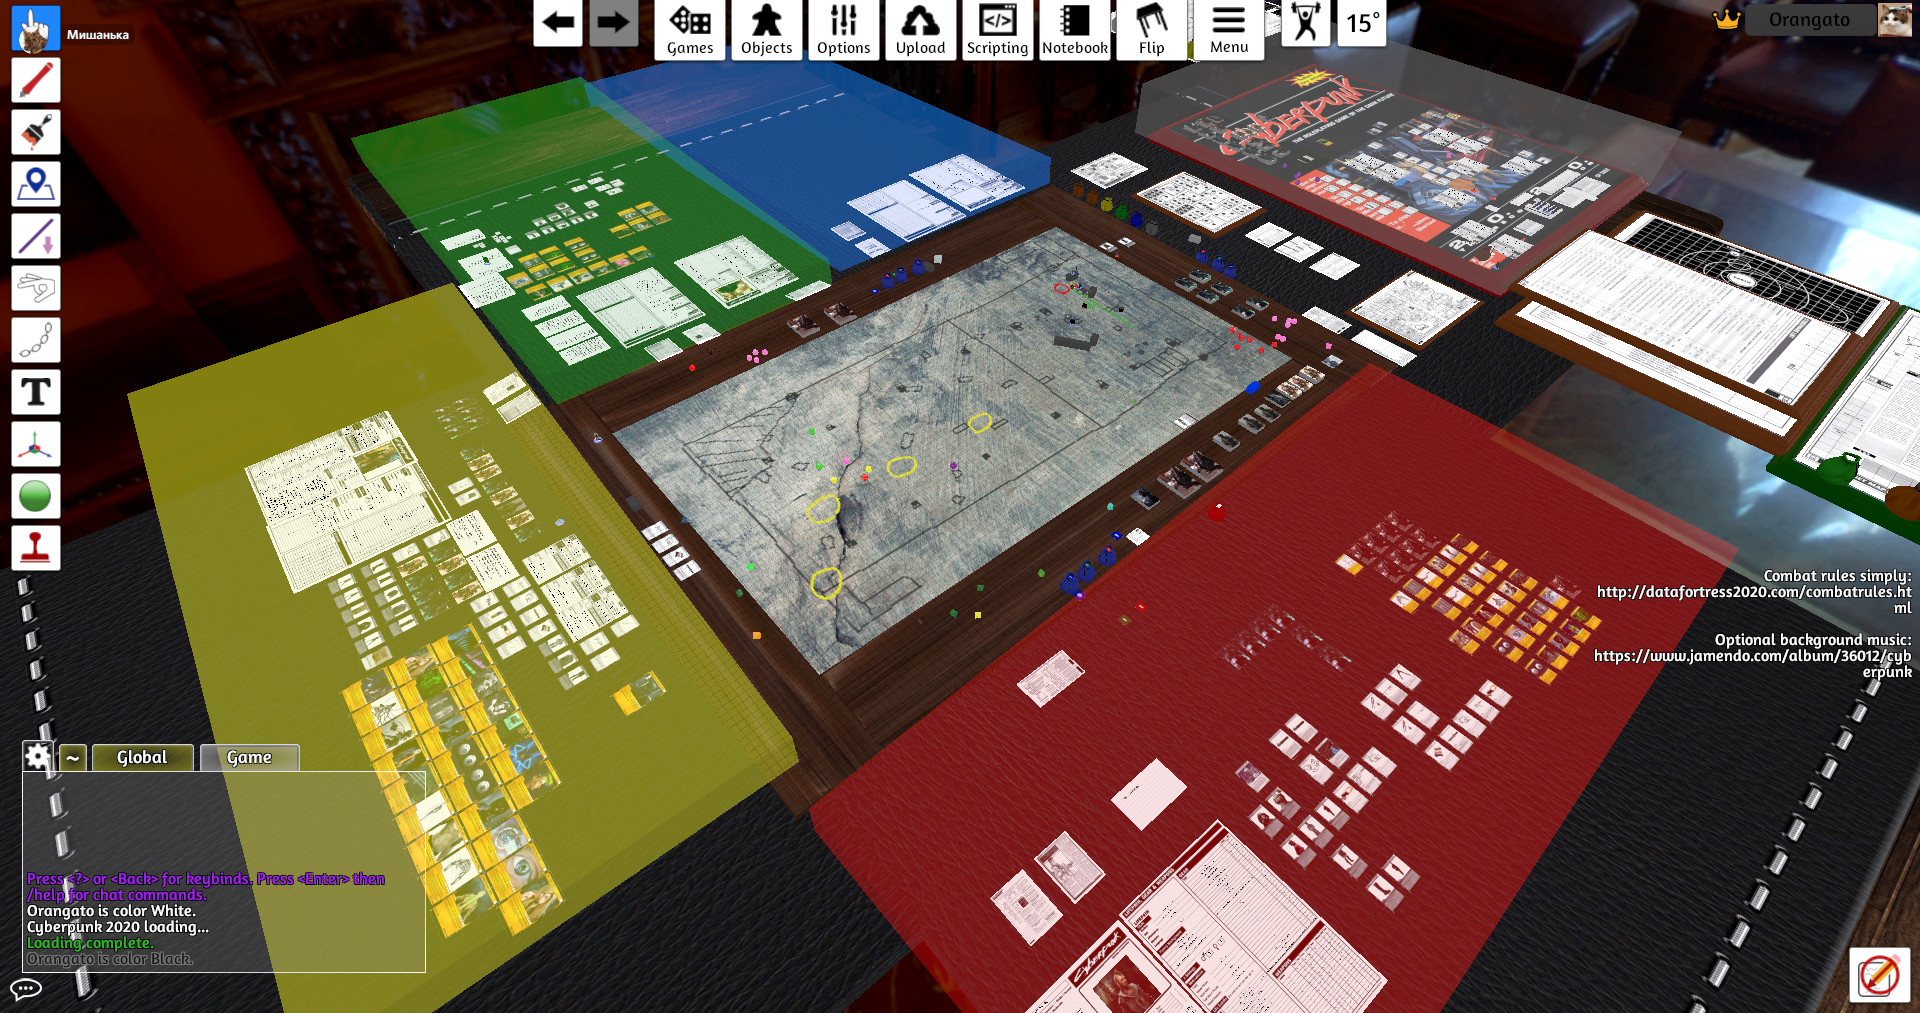 Board Games 2020.Steam Workshop Cyberpunk 2020 Pnp Materials